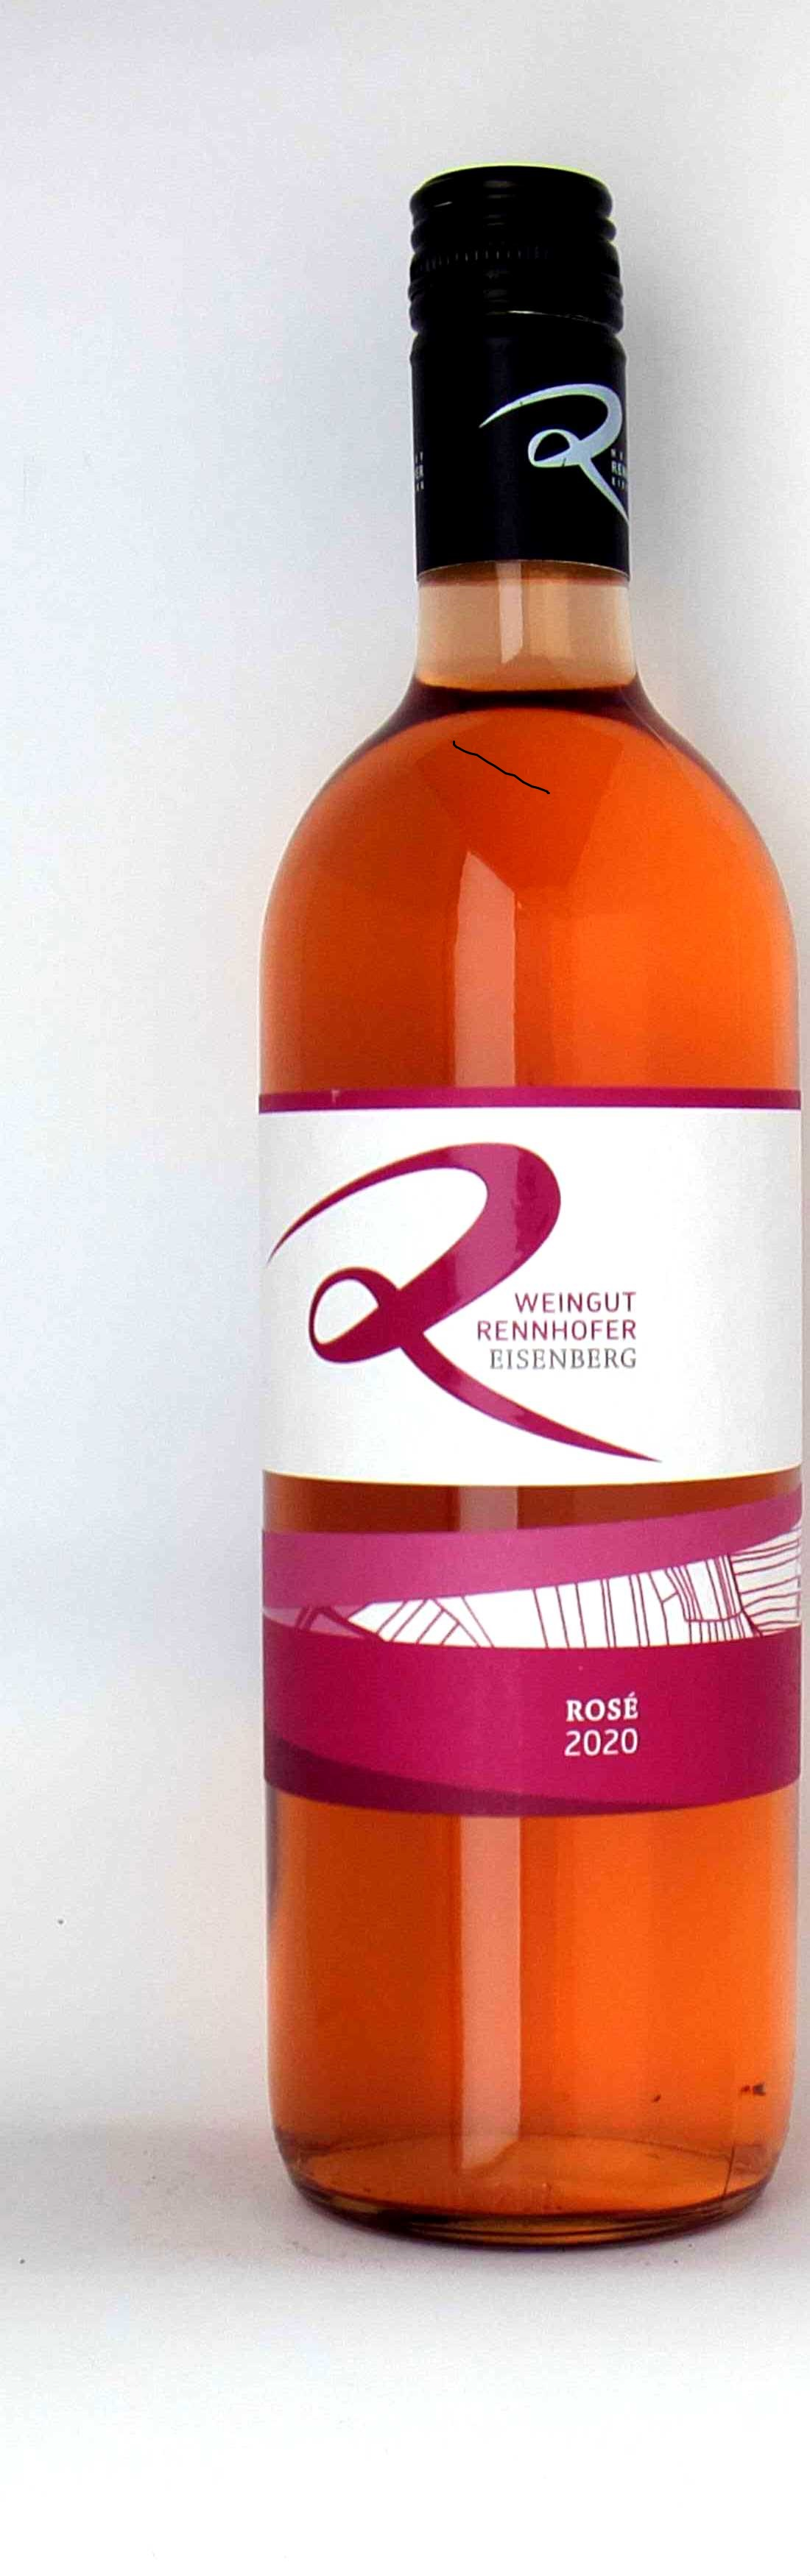 Vinothek Eisenberg Rose 2020 Rennhofer